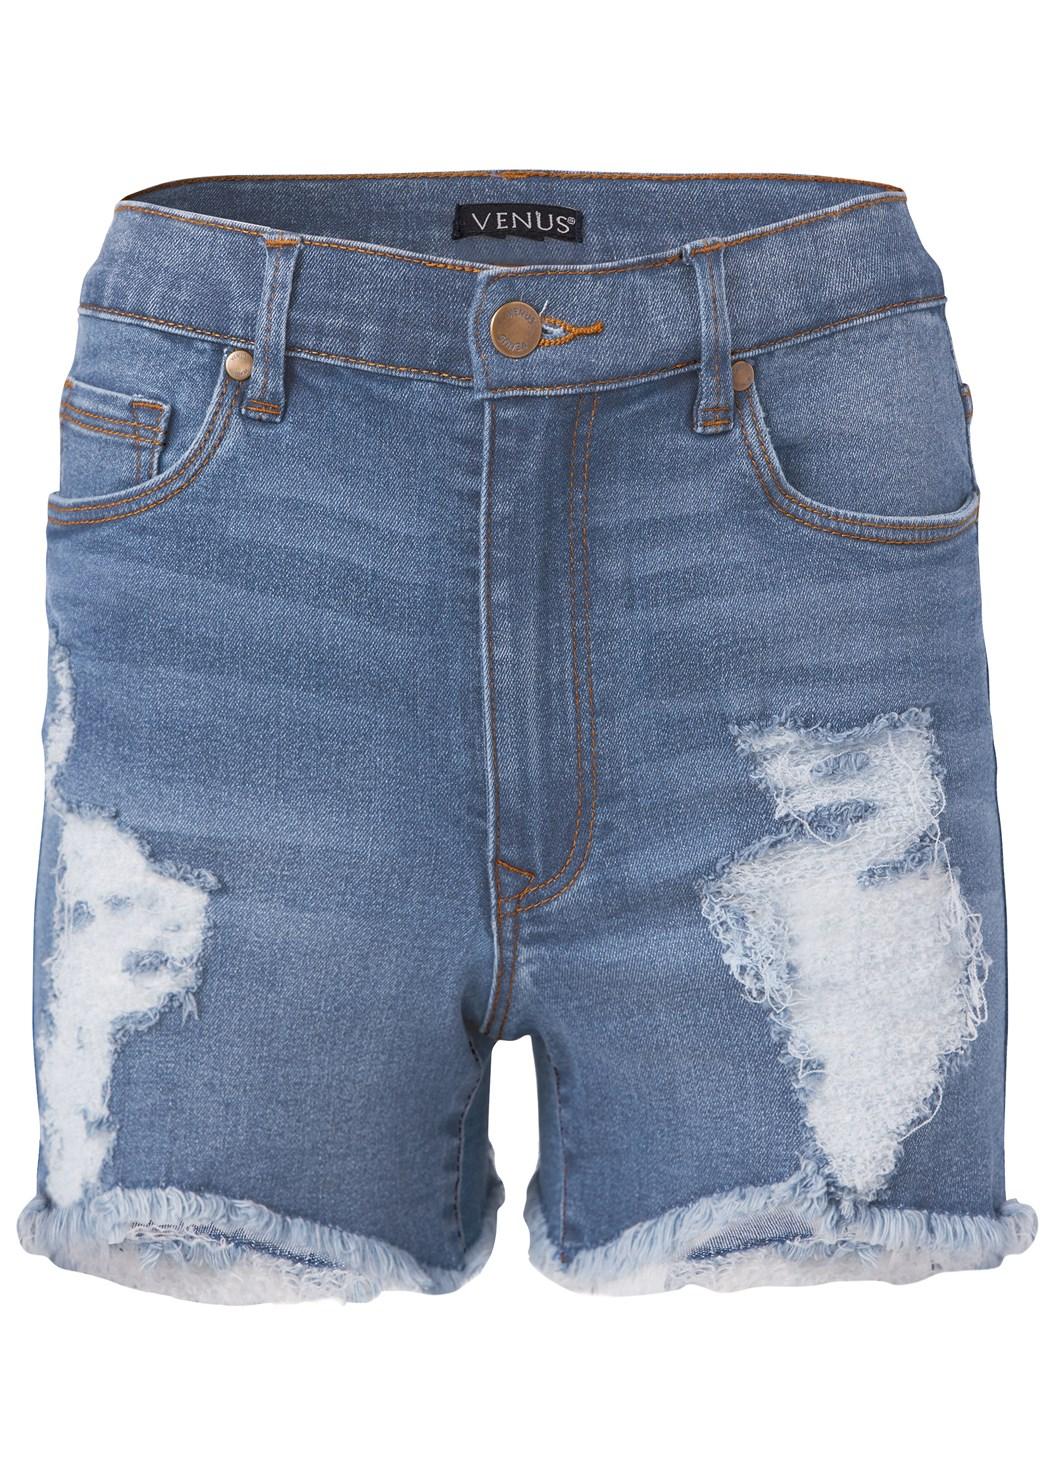 Distressed Jean Shorts,Cap Sleeve Basic Top,Elastic Back Visor